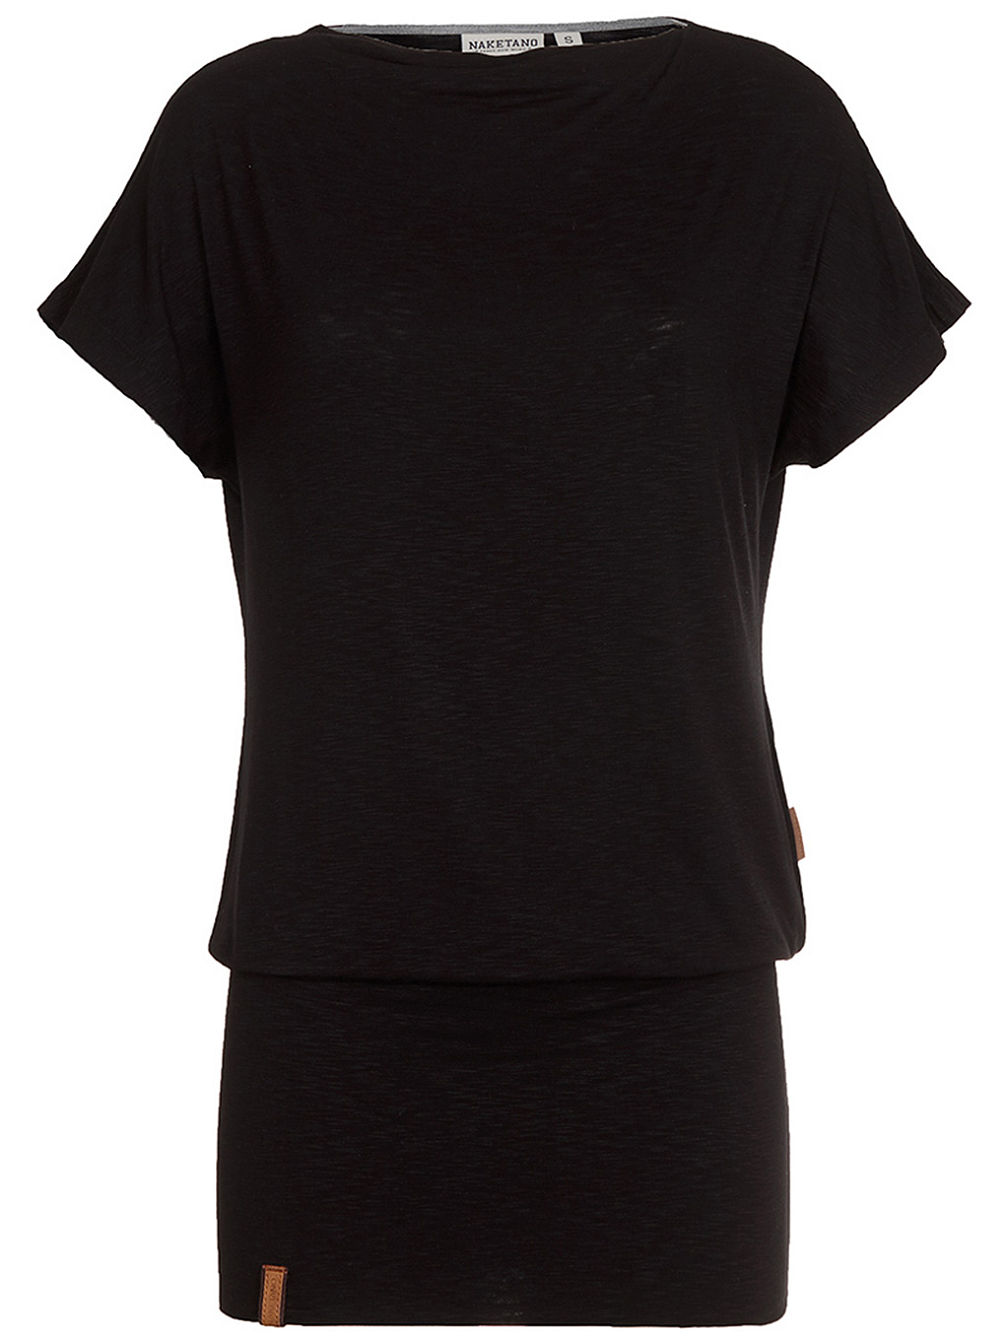 naketano-linda-ix-t-shirt